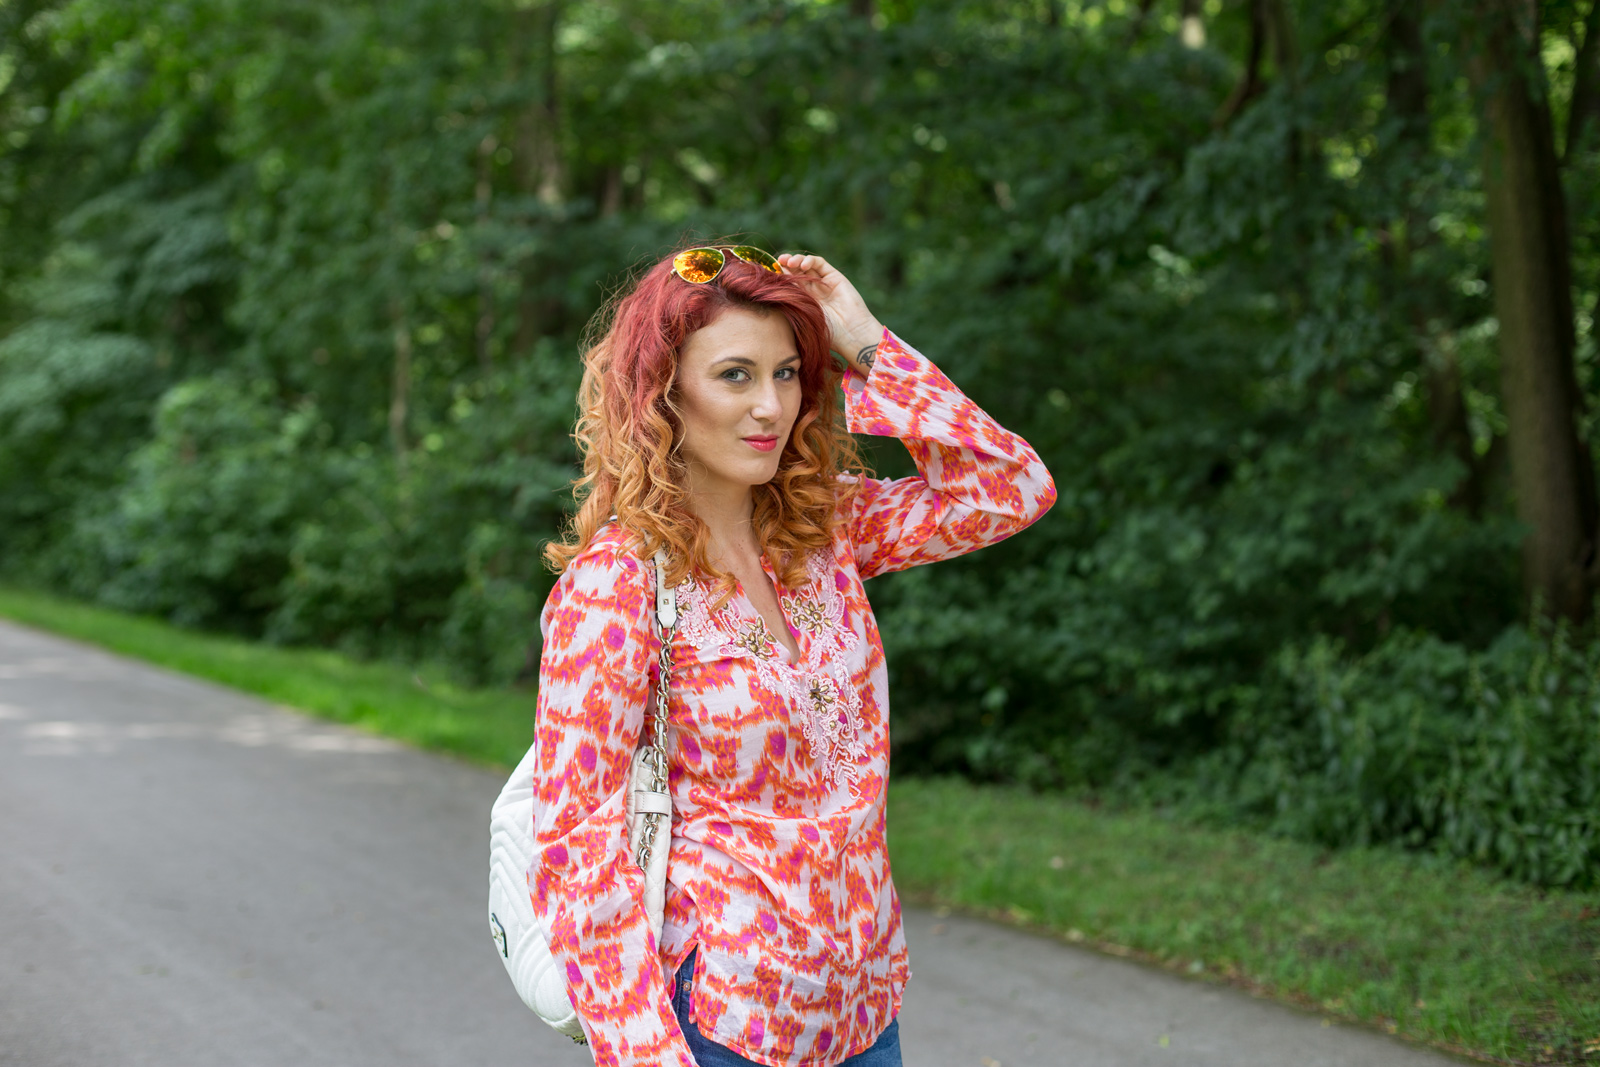 Foto_by_Nadja_Nemetz_Laxenburg_Outfit_Fashion_Mode_Modeblogger_Blogger_2